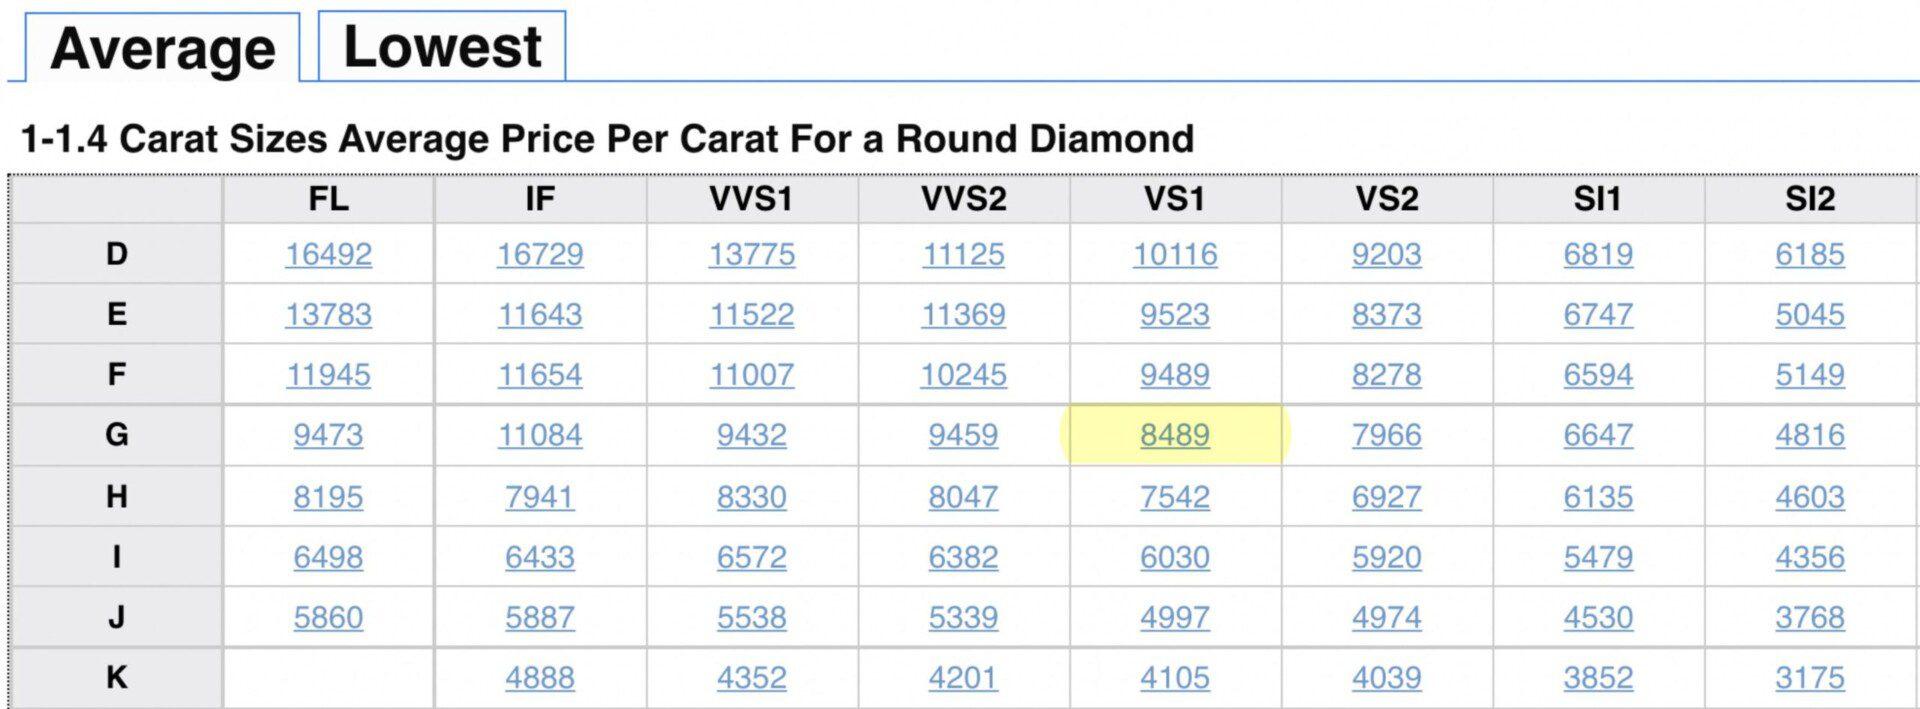 Average Diamond Price per Carat.